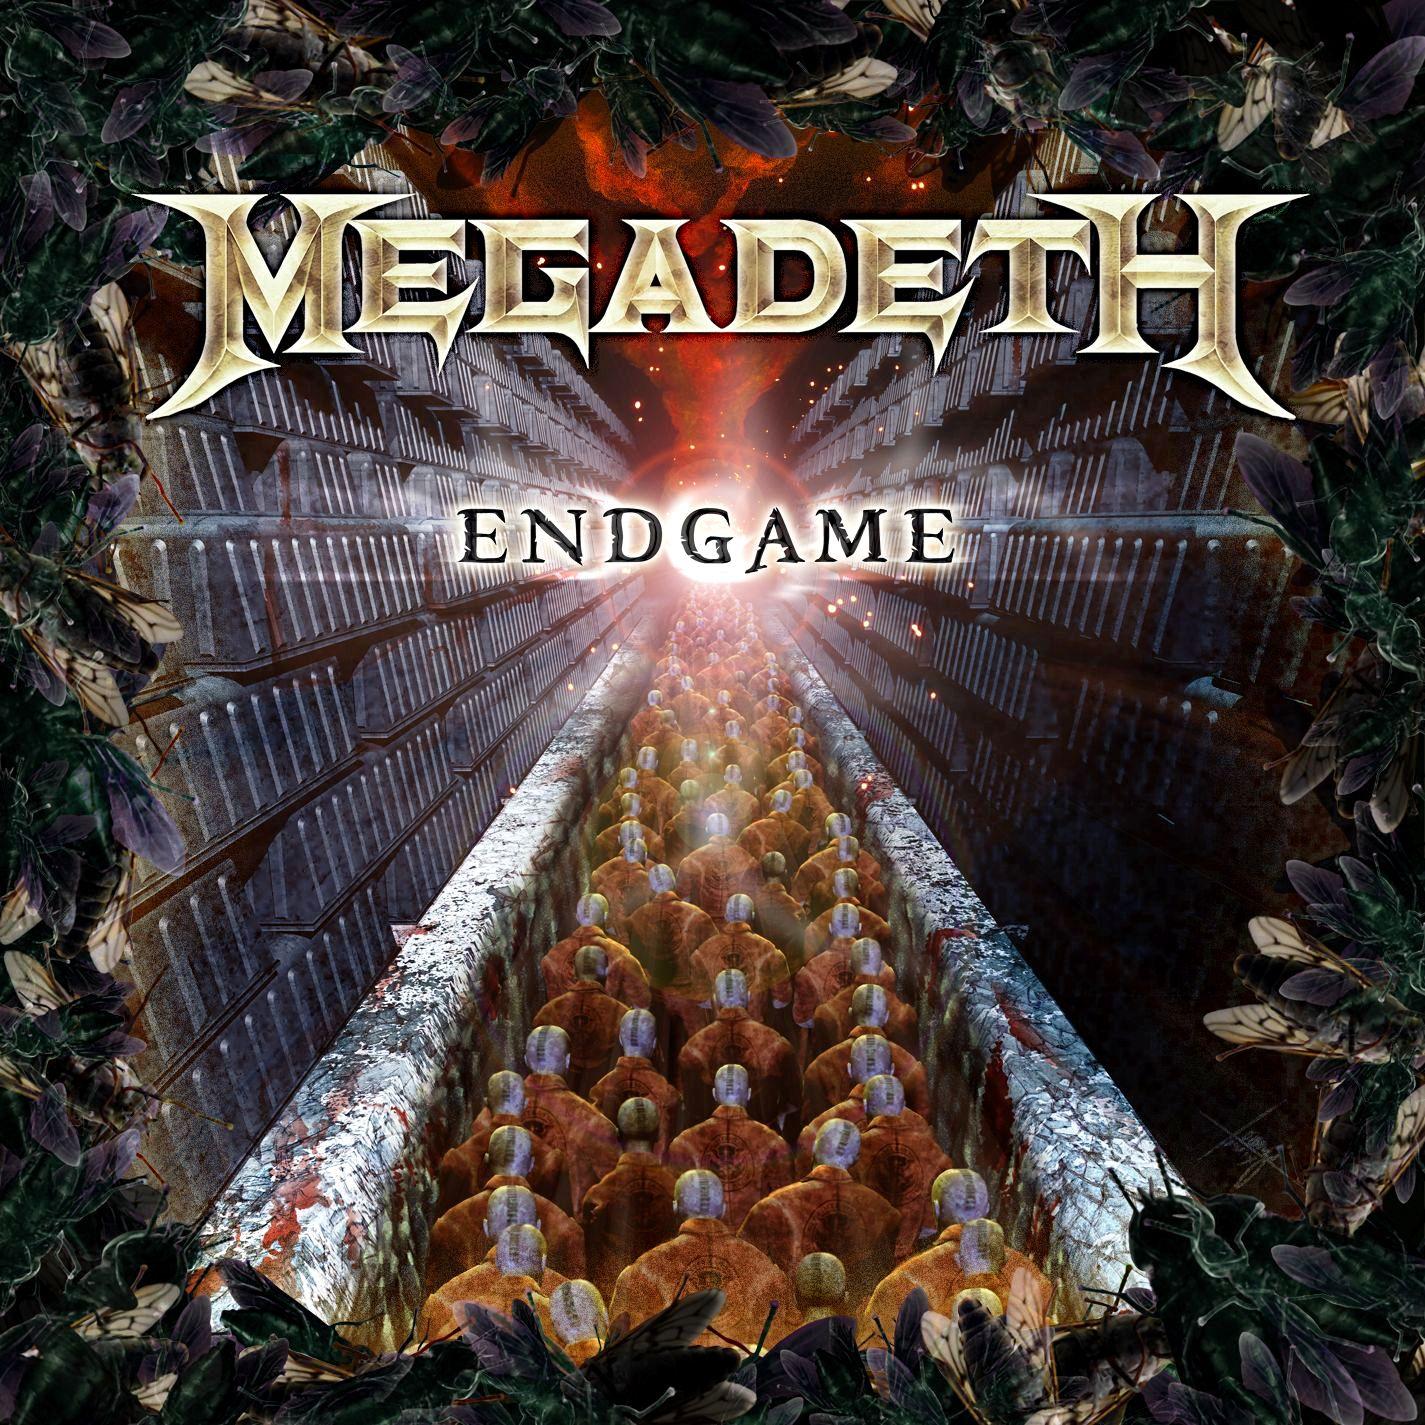 Megadeth - Endgame album cover